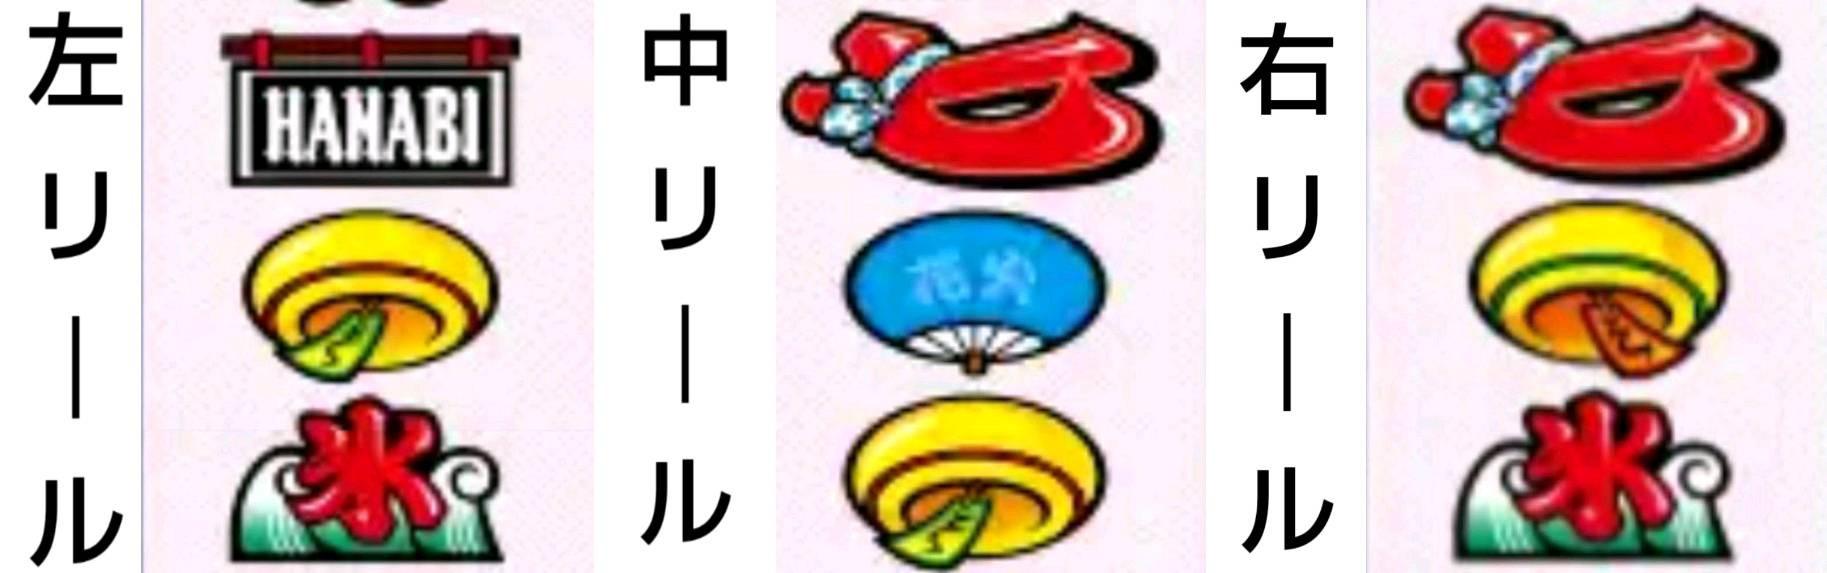 f:id:karutookaruto:20181021234721j:image